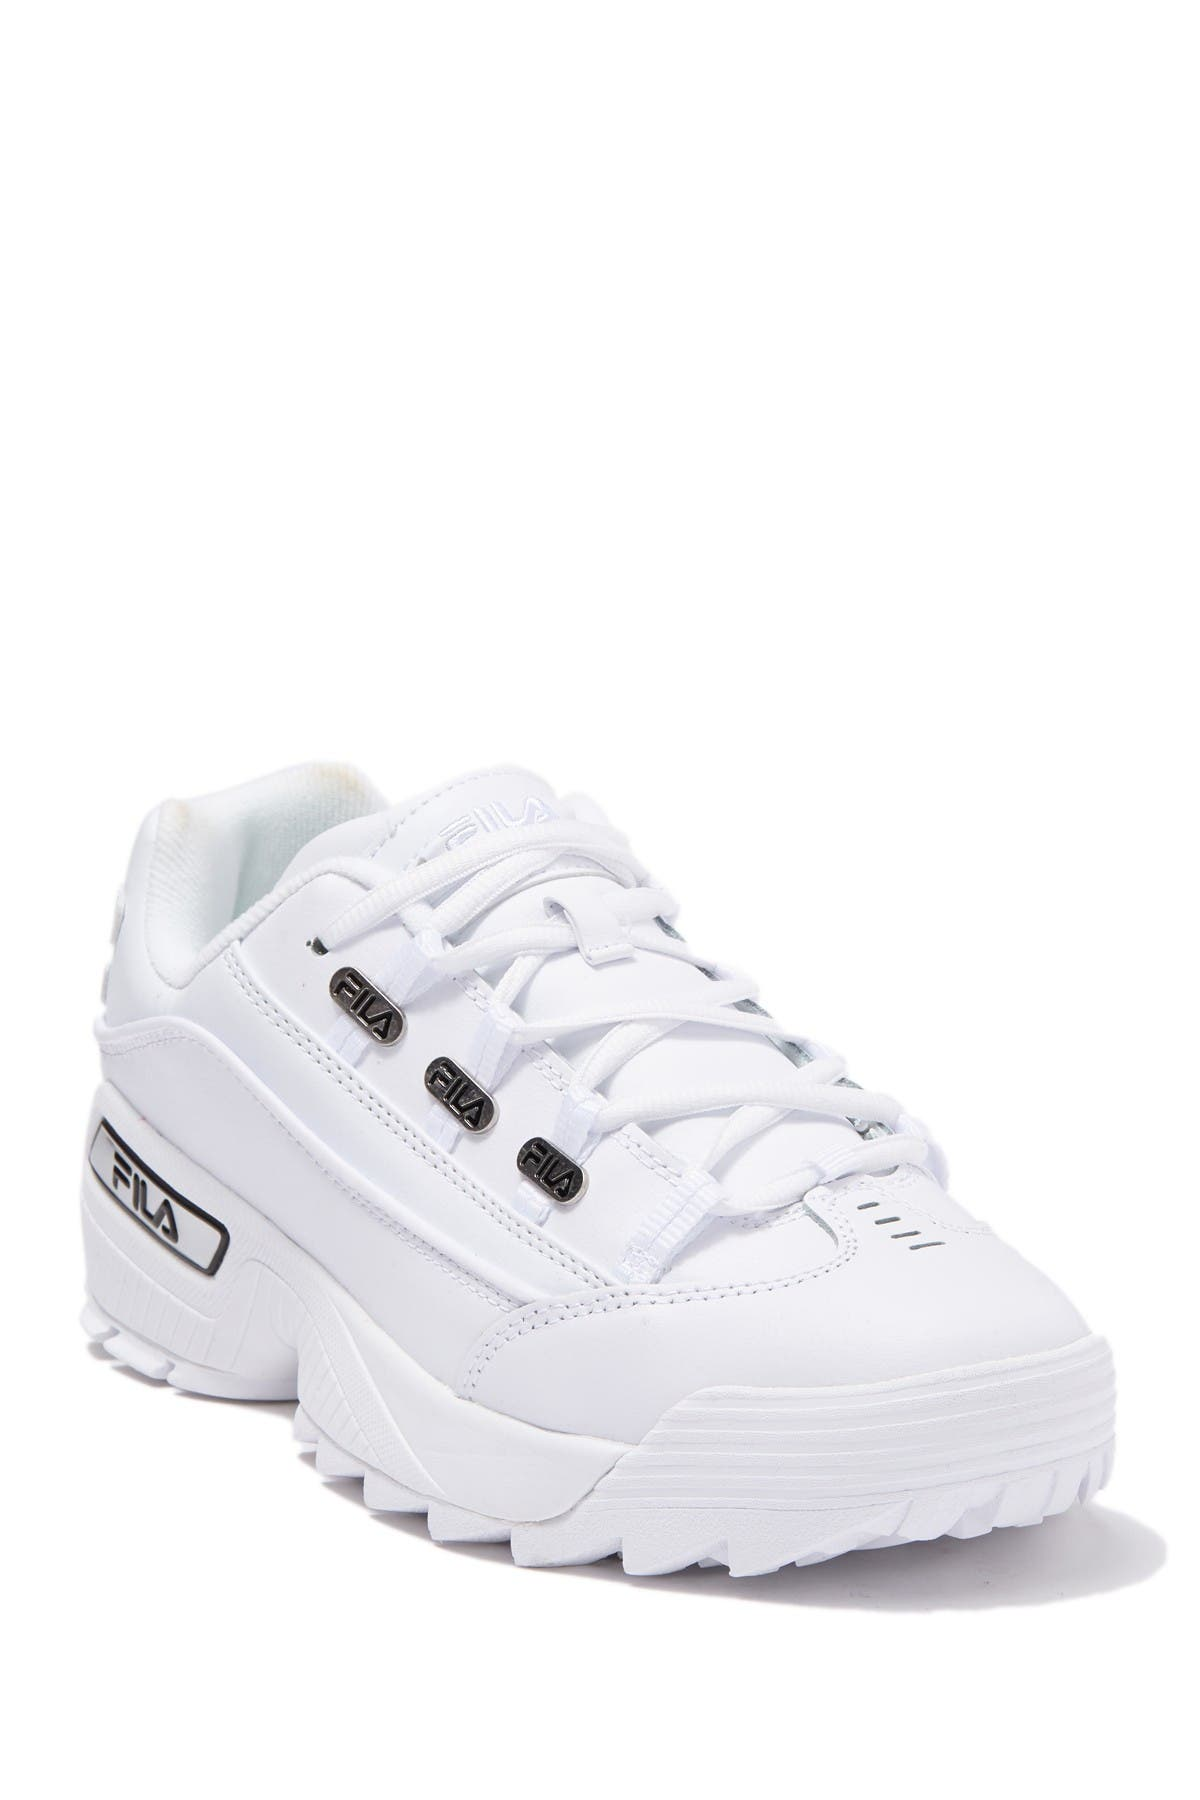 FILA USA | Hometown Sneaker | HauteLook